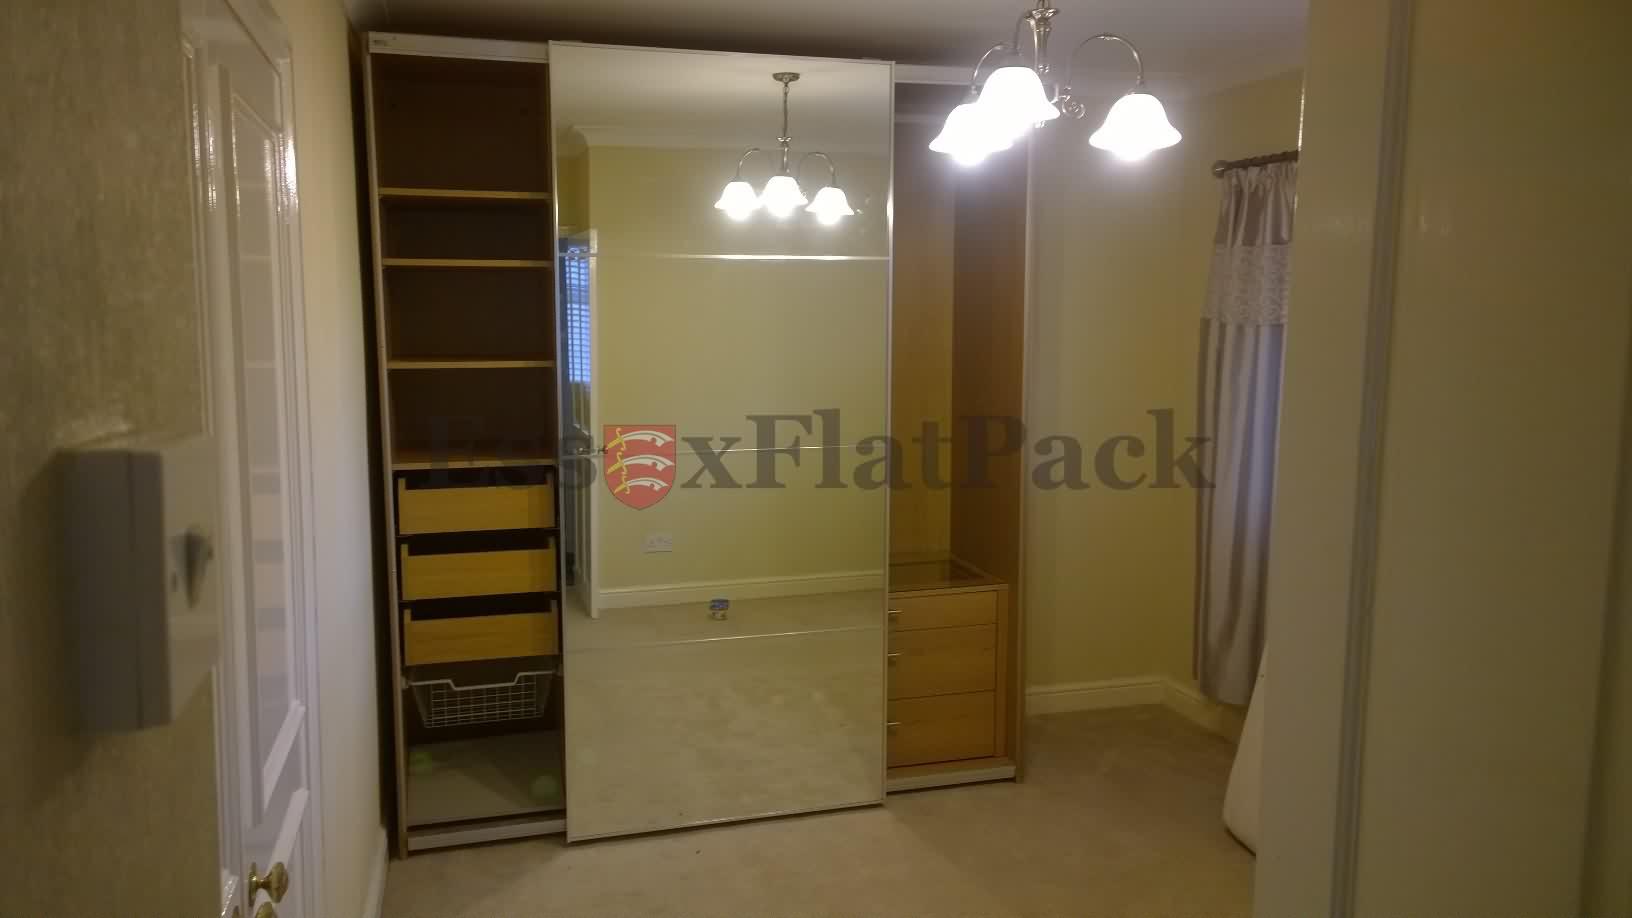 essexflatpack-furniture-20150722190128.jpg